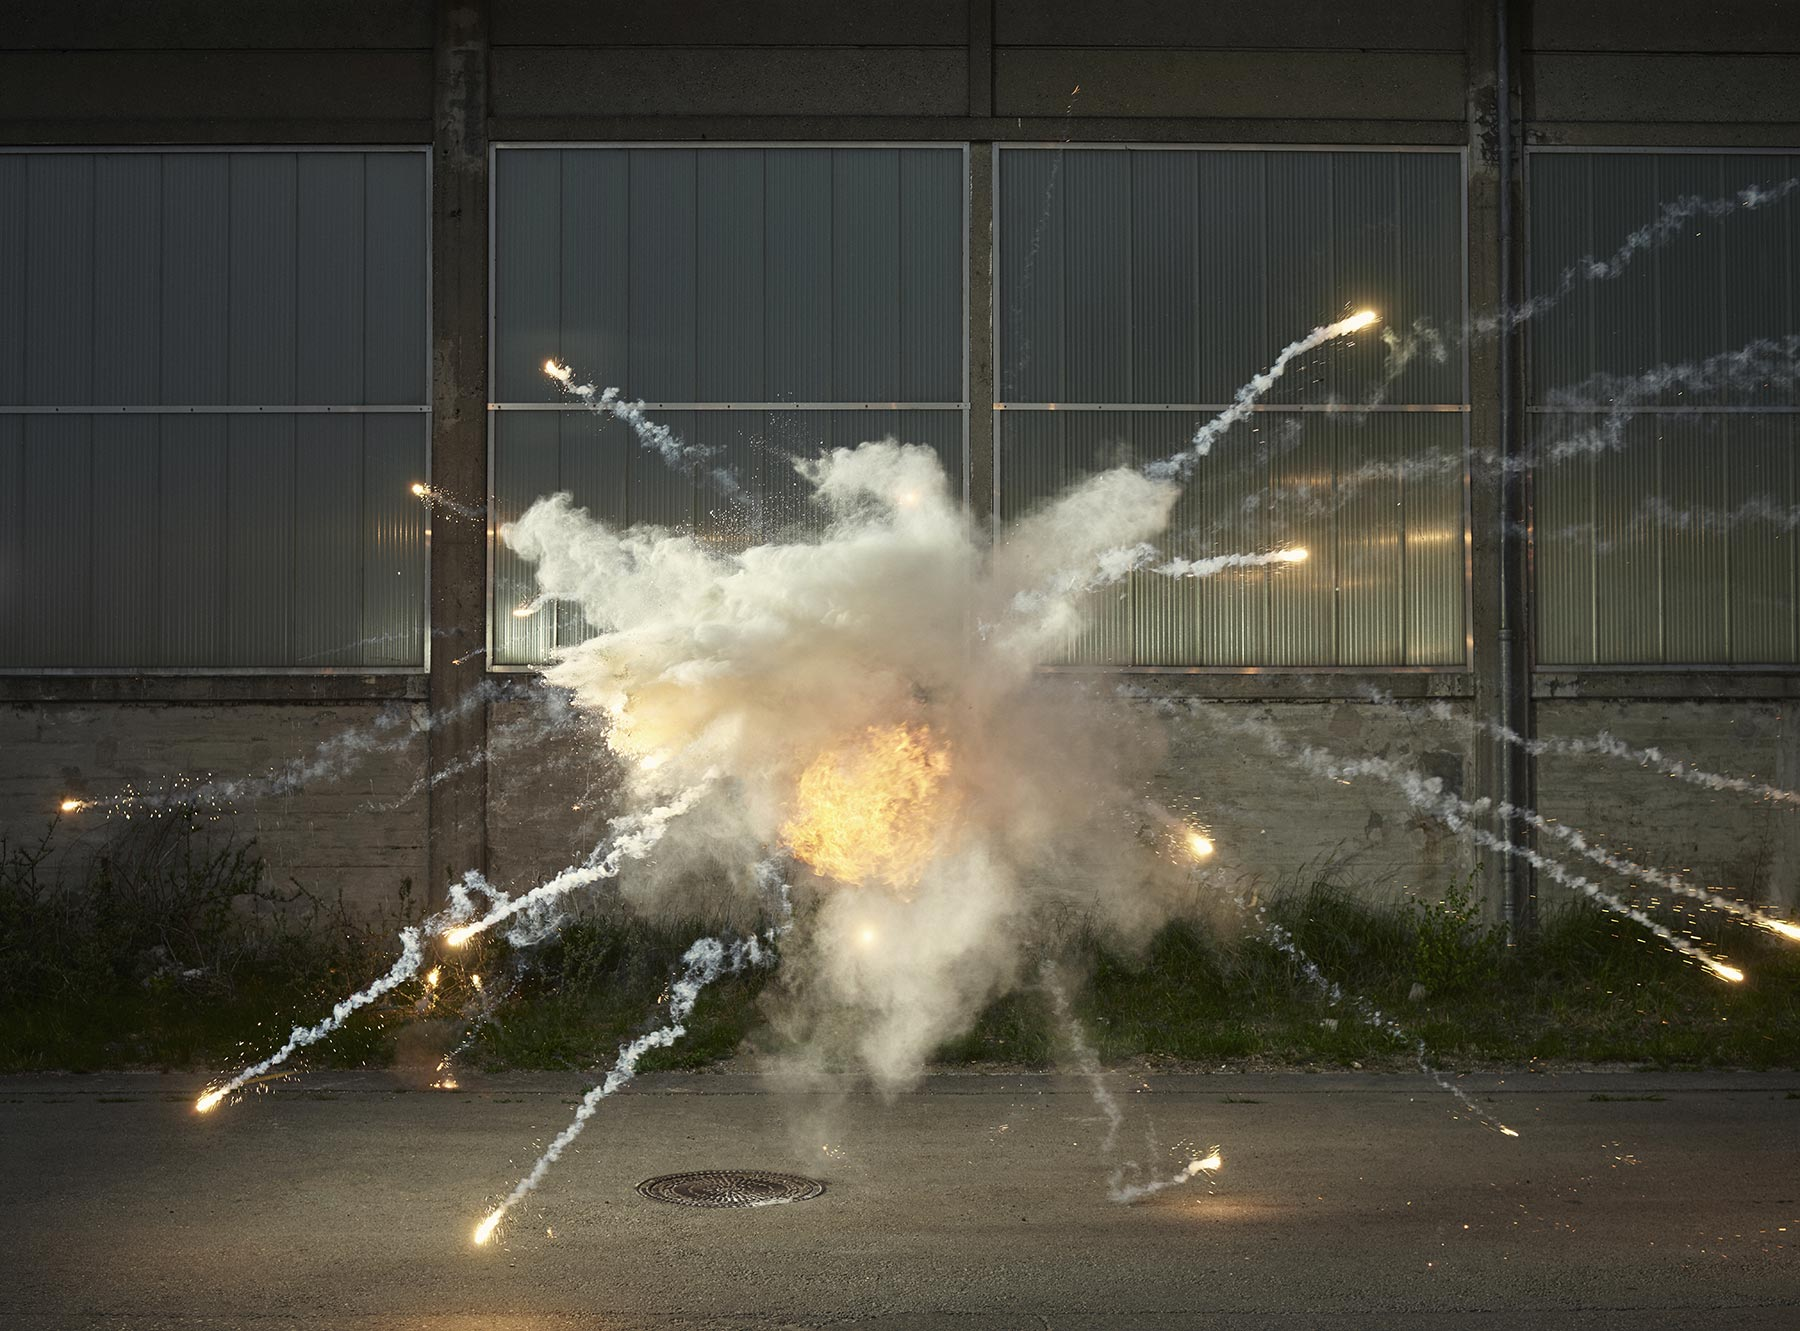 16explosion3.0